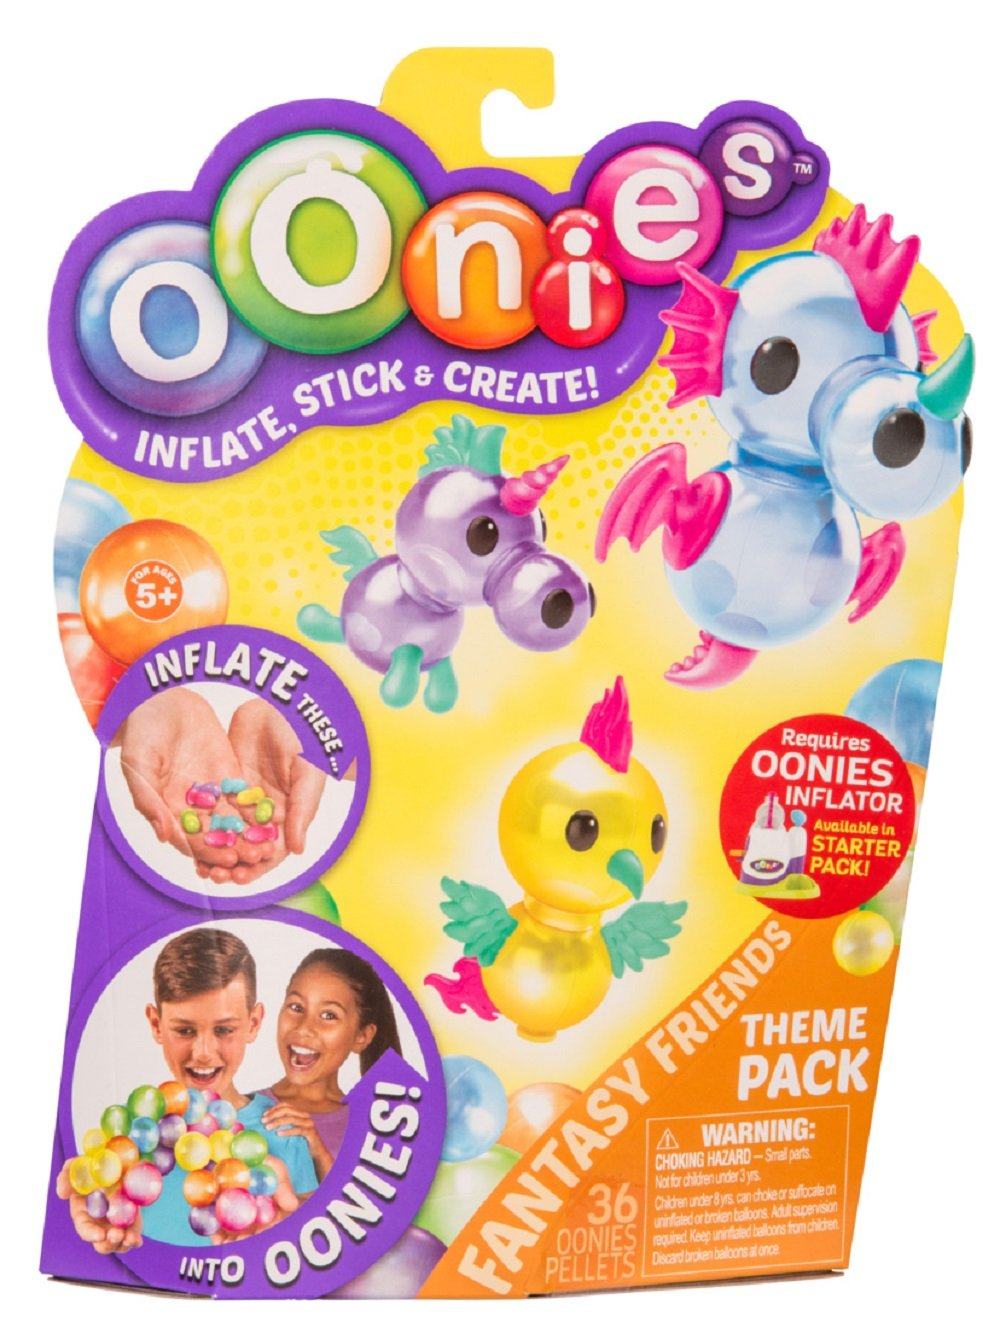 Oonies S2 Theme Refill Pack - Fantasy Friends